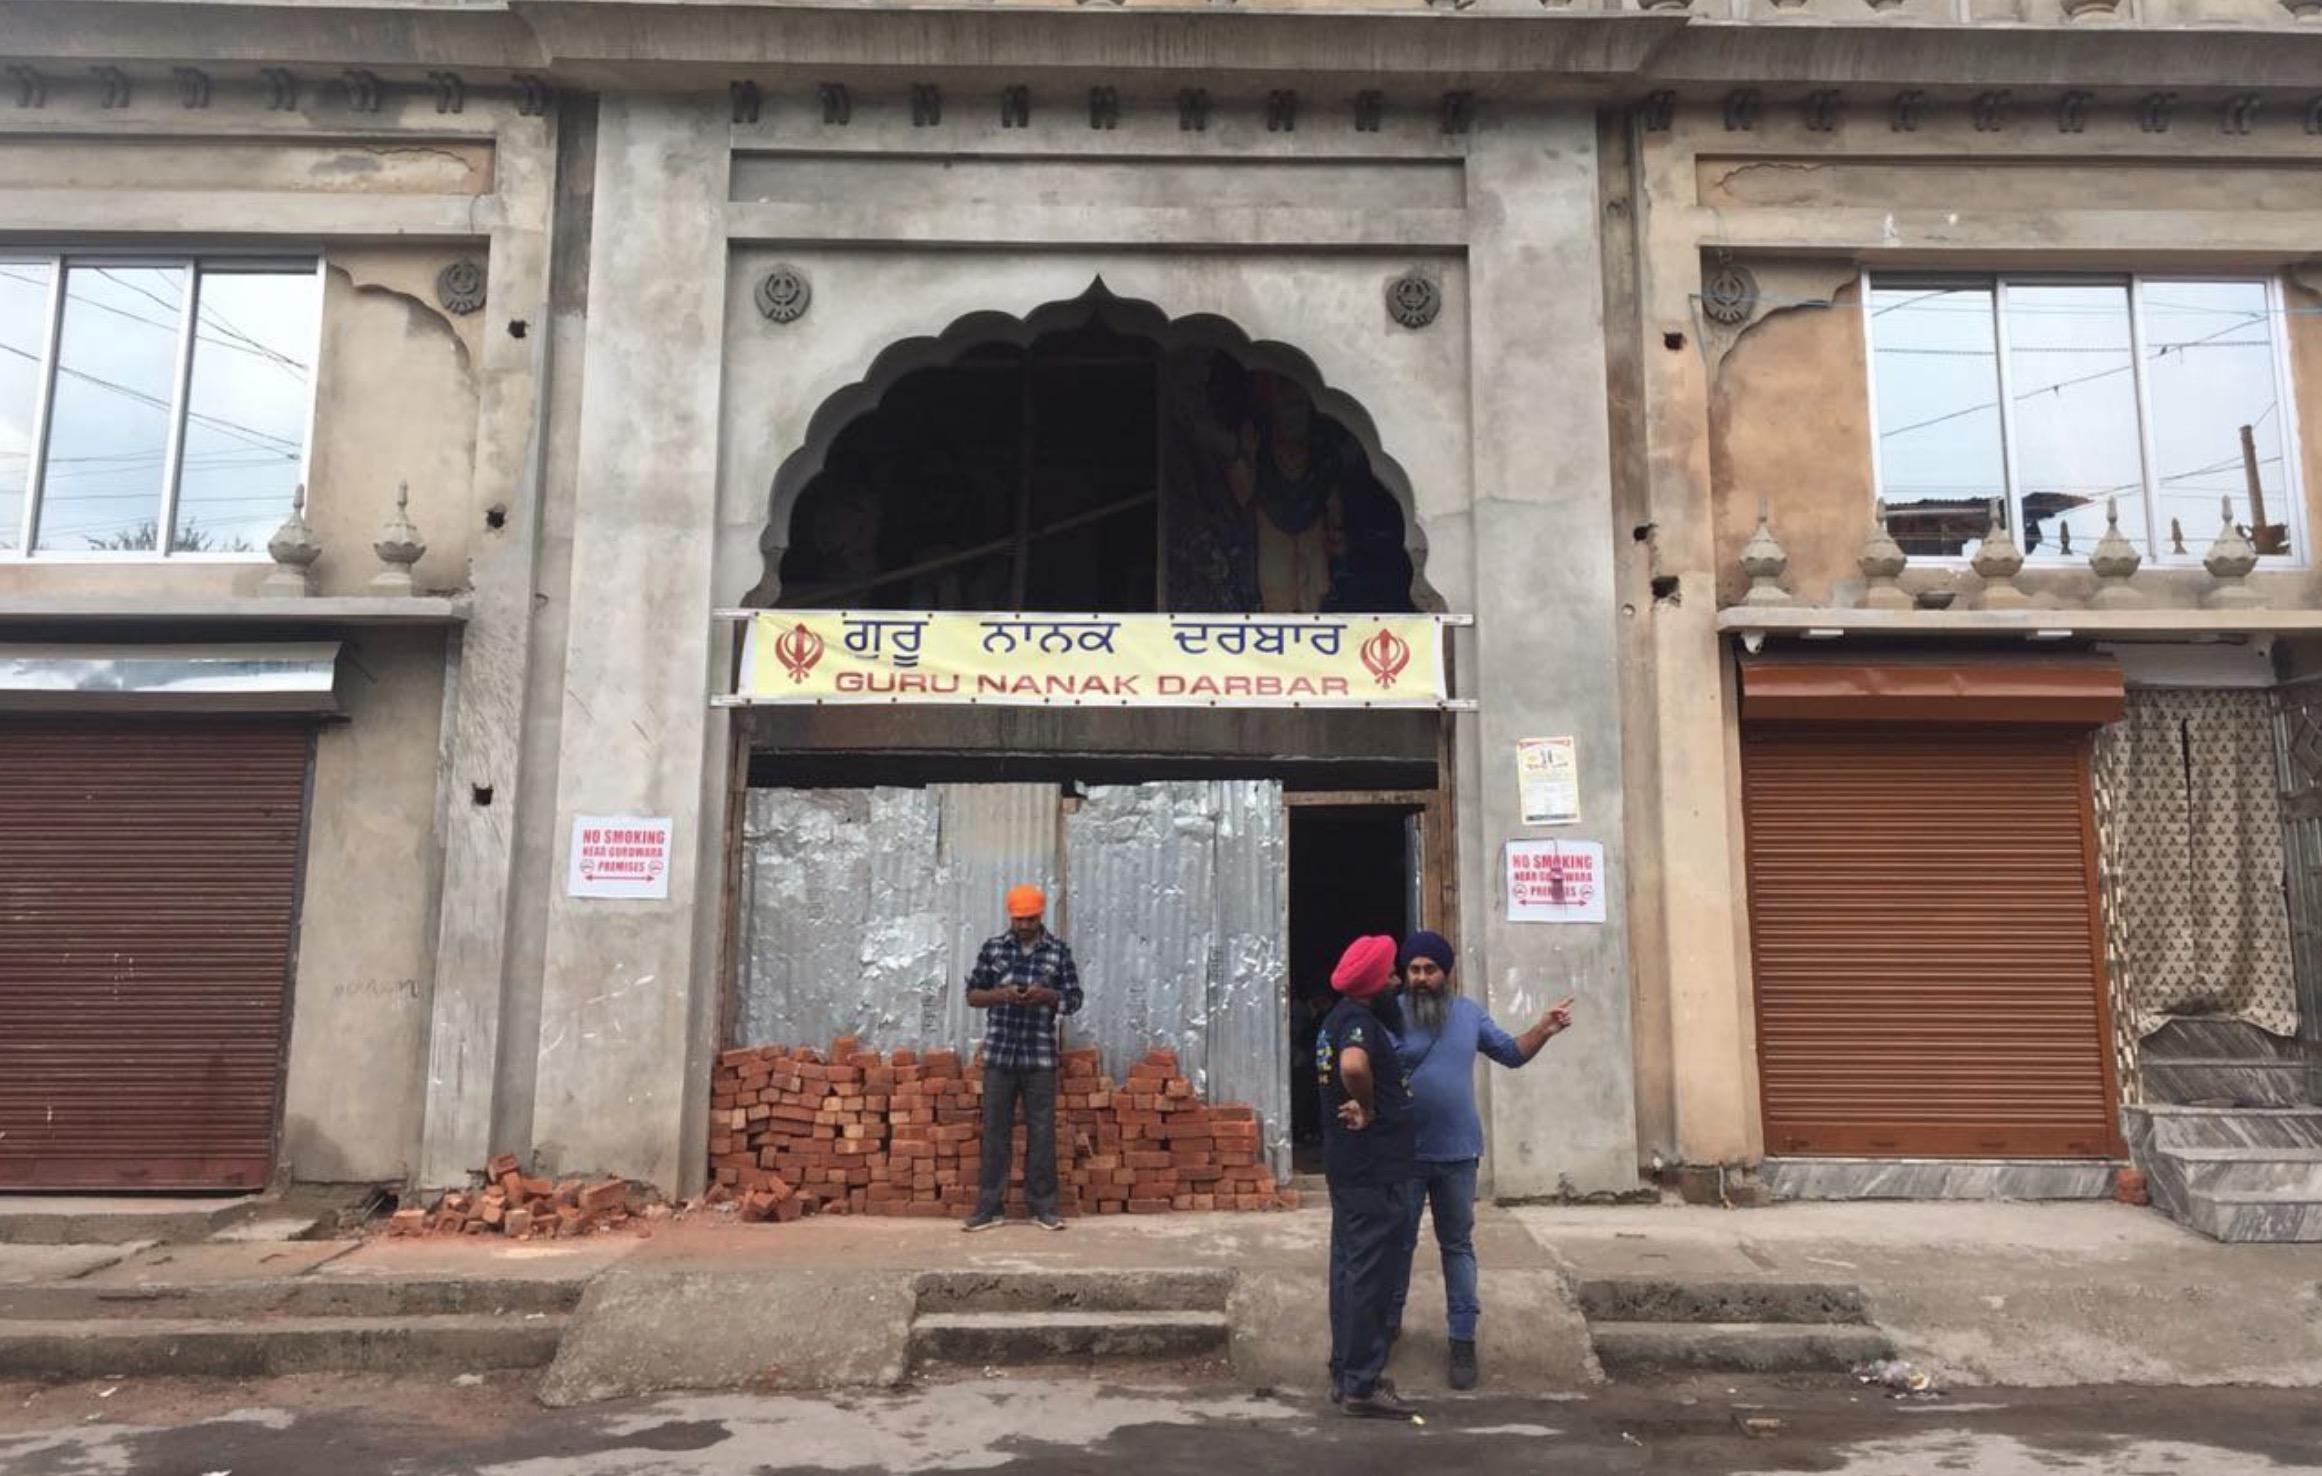 India - The dilemmas of Shillong's Dalit Punjabis - Kractivism